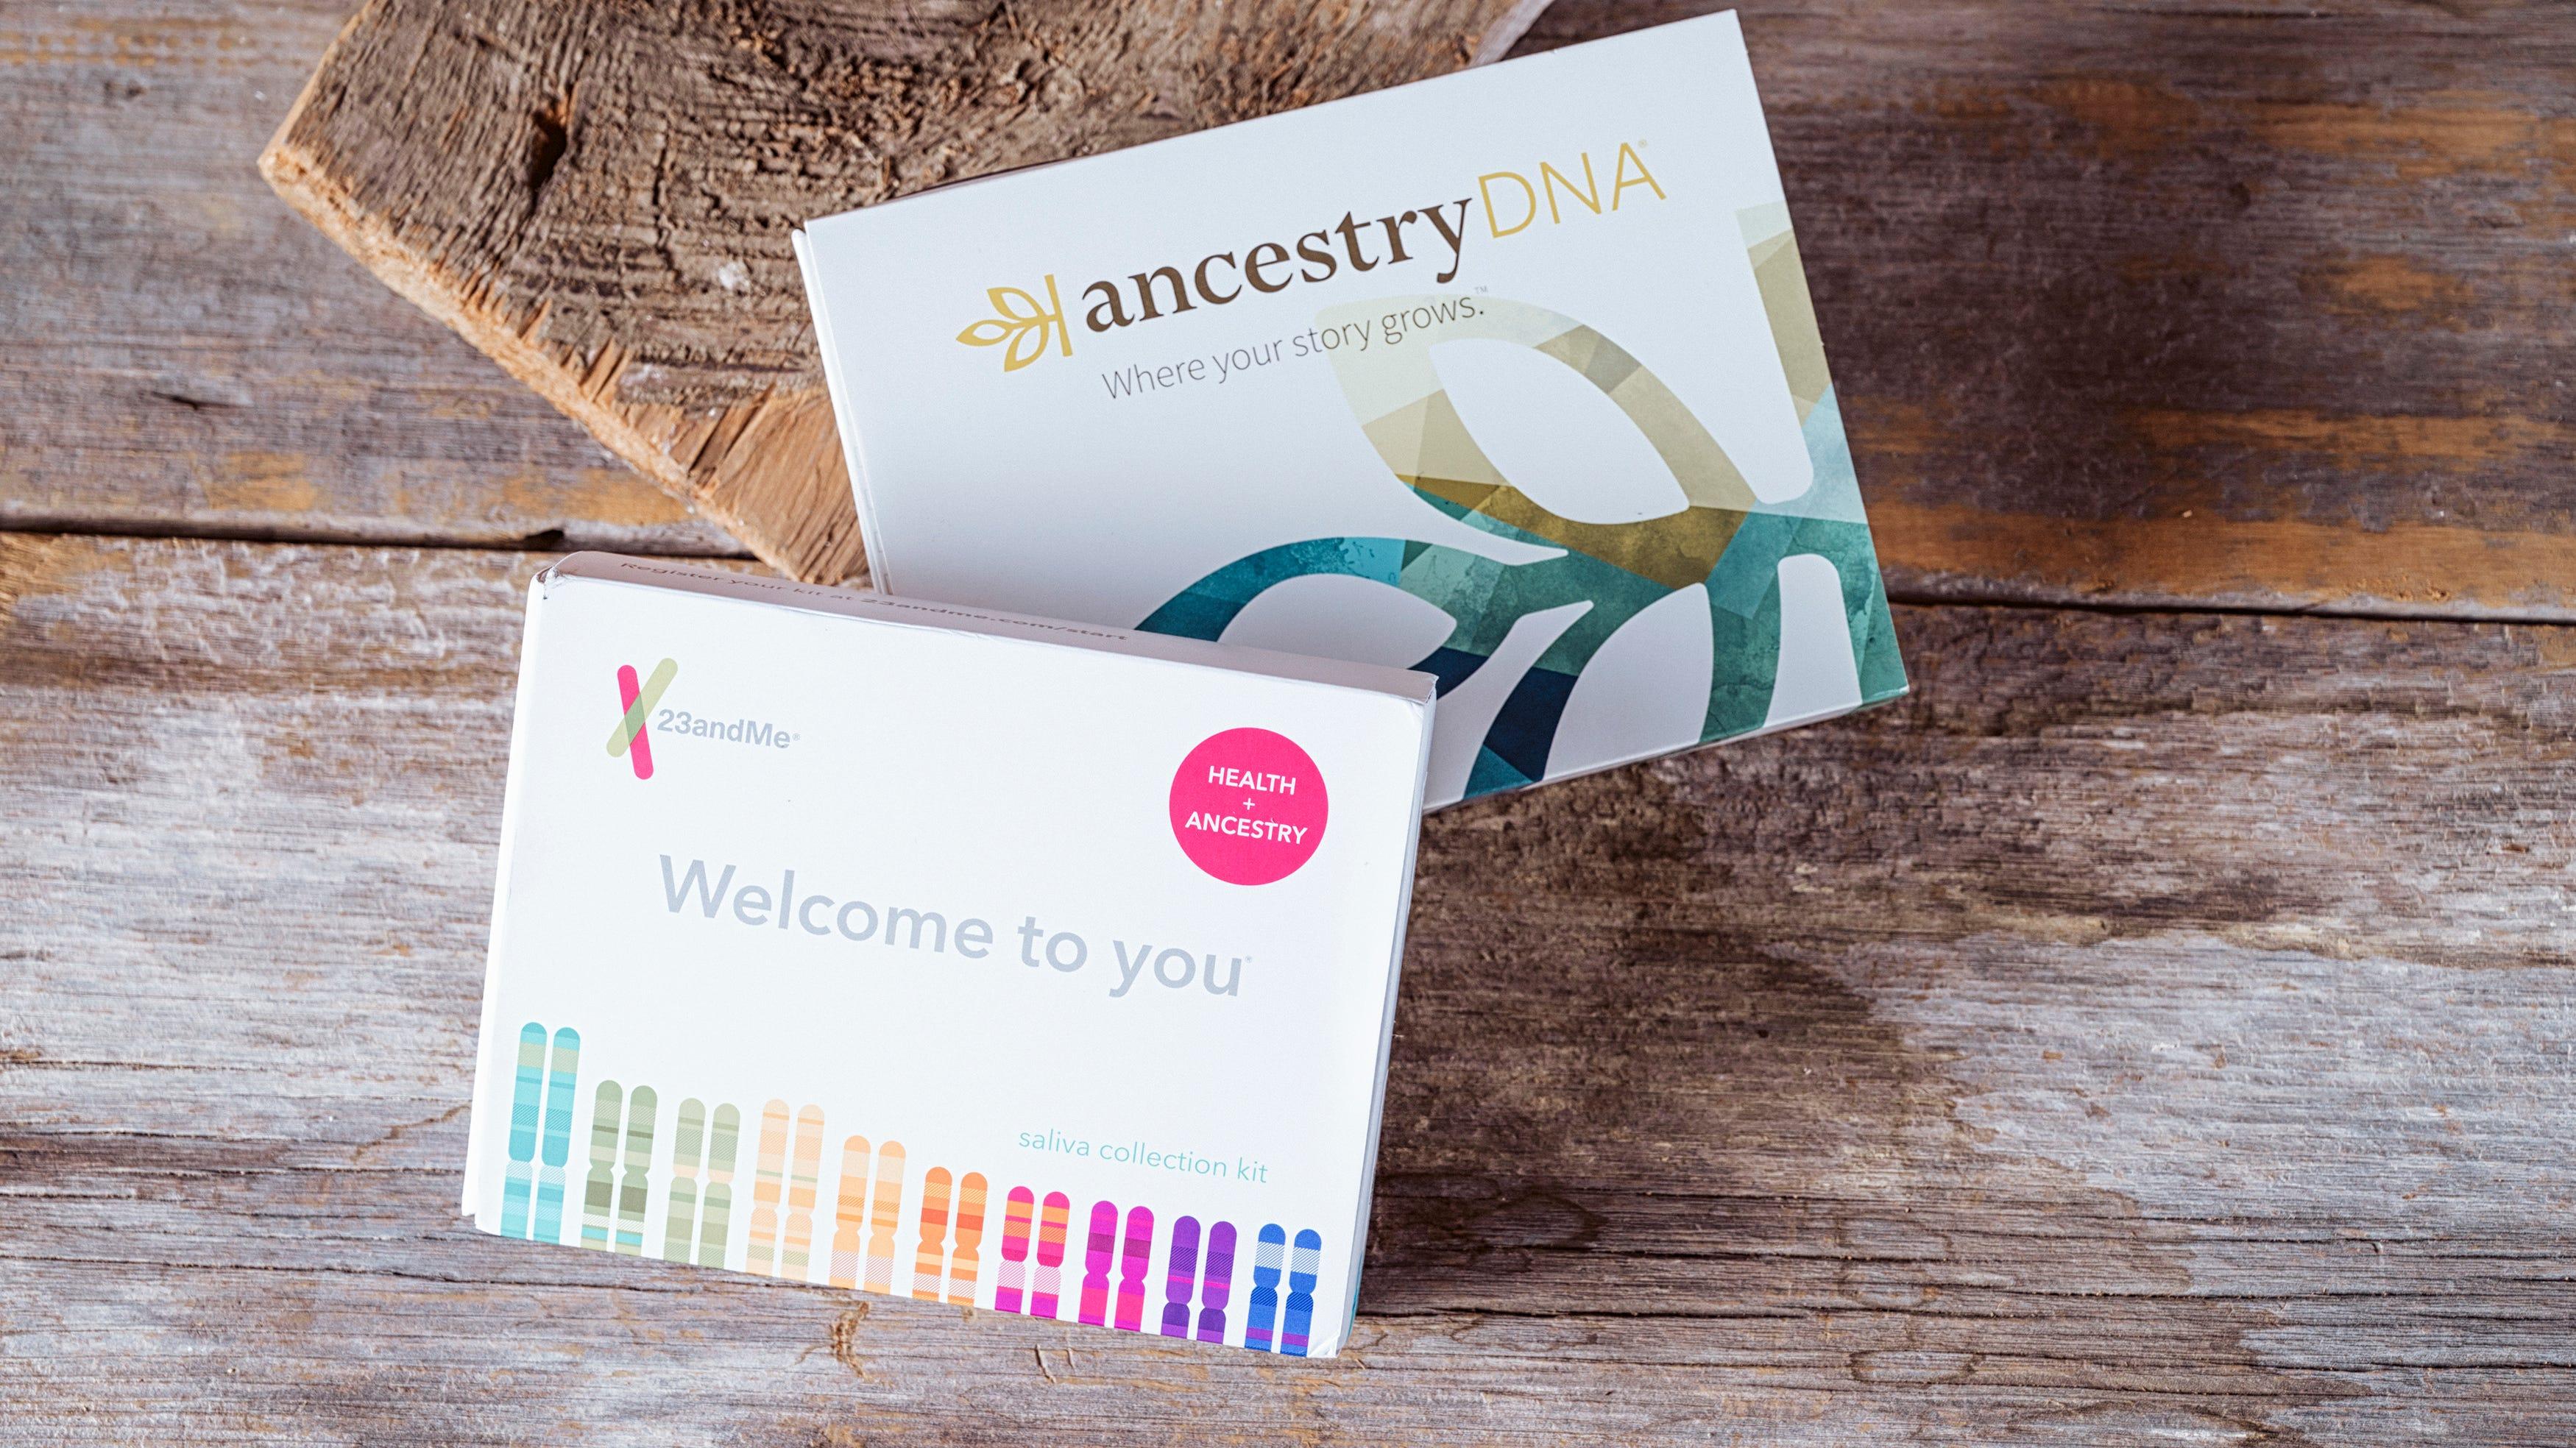 Genetic Genealogy Companies Ancestry 23andme Begin Covid 19 Research